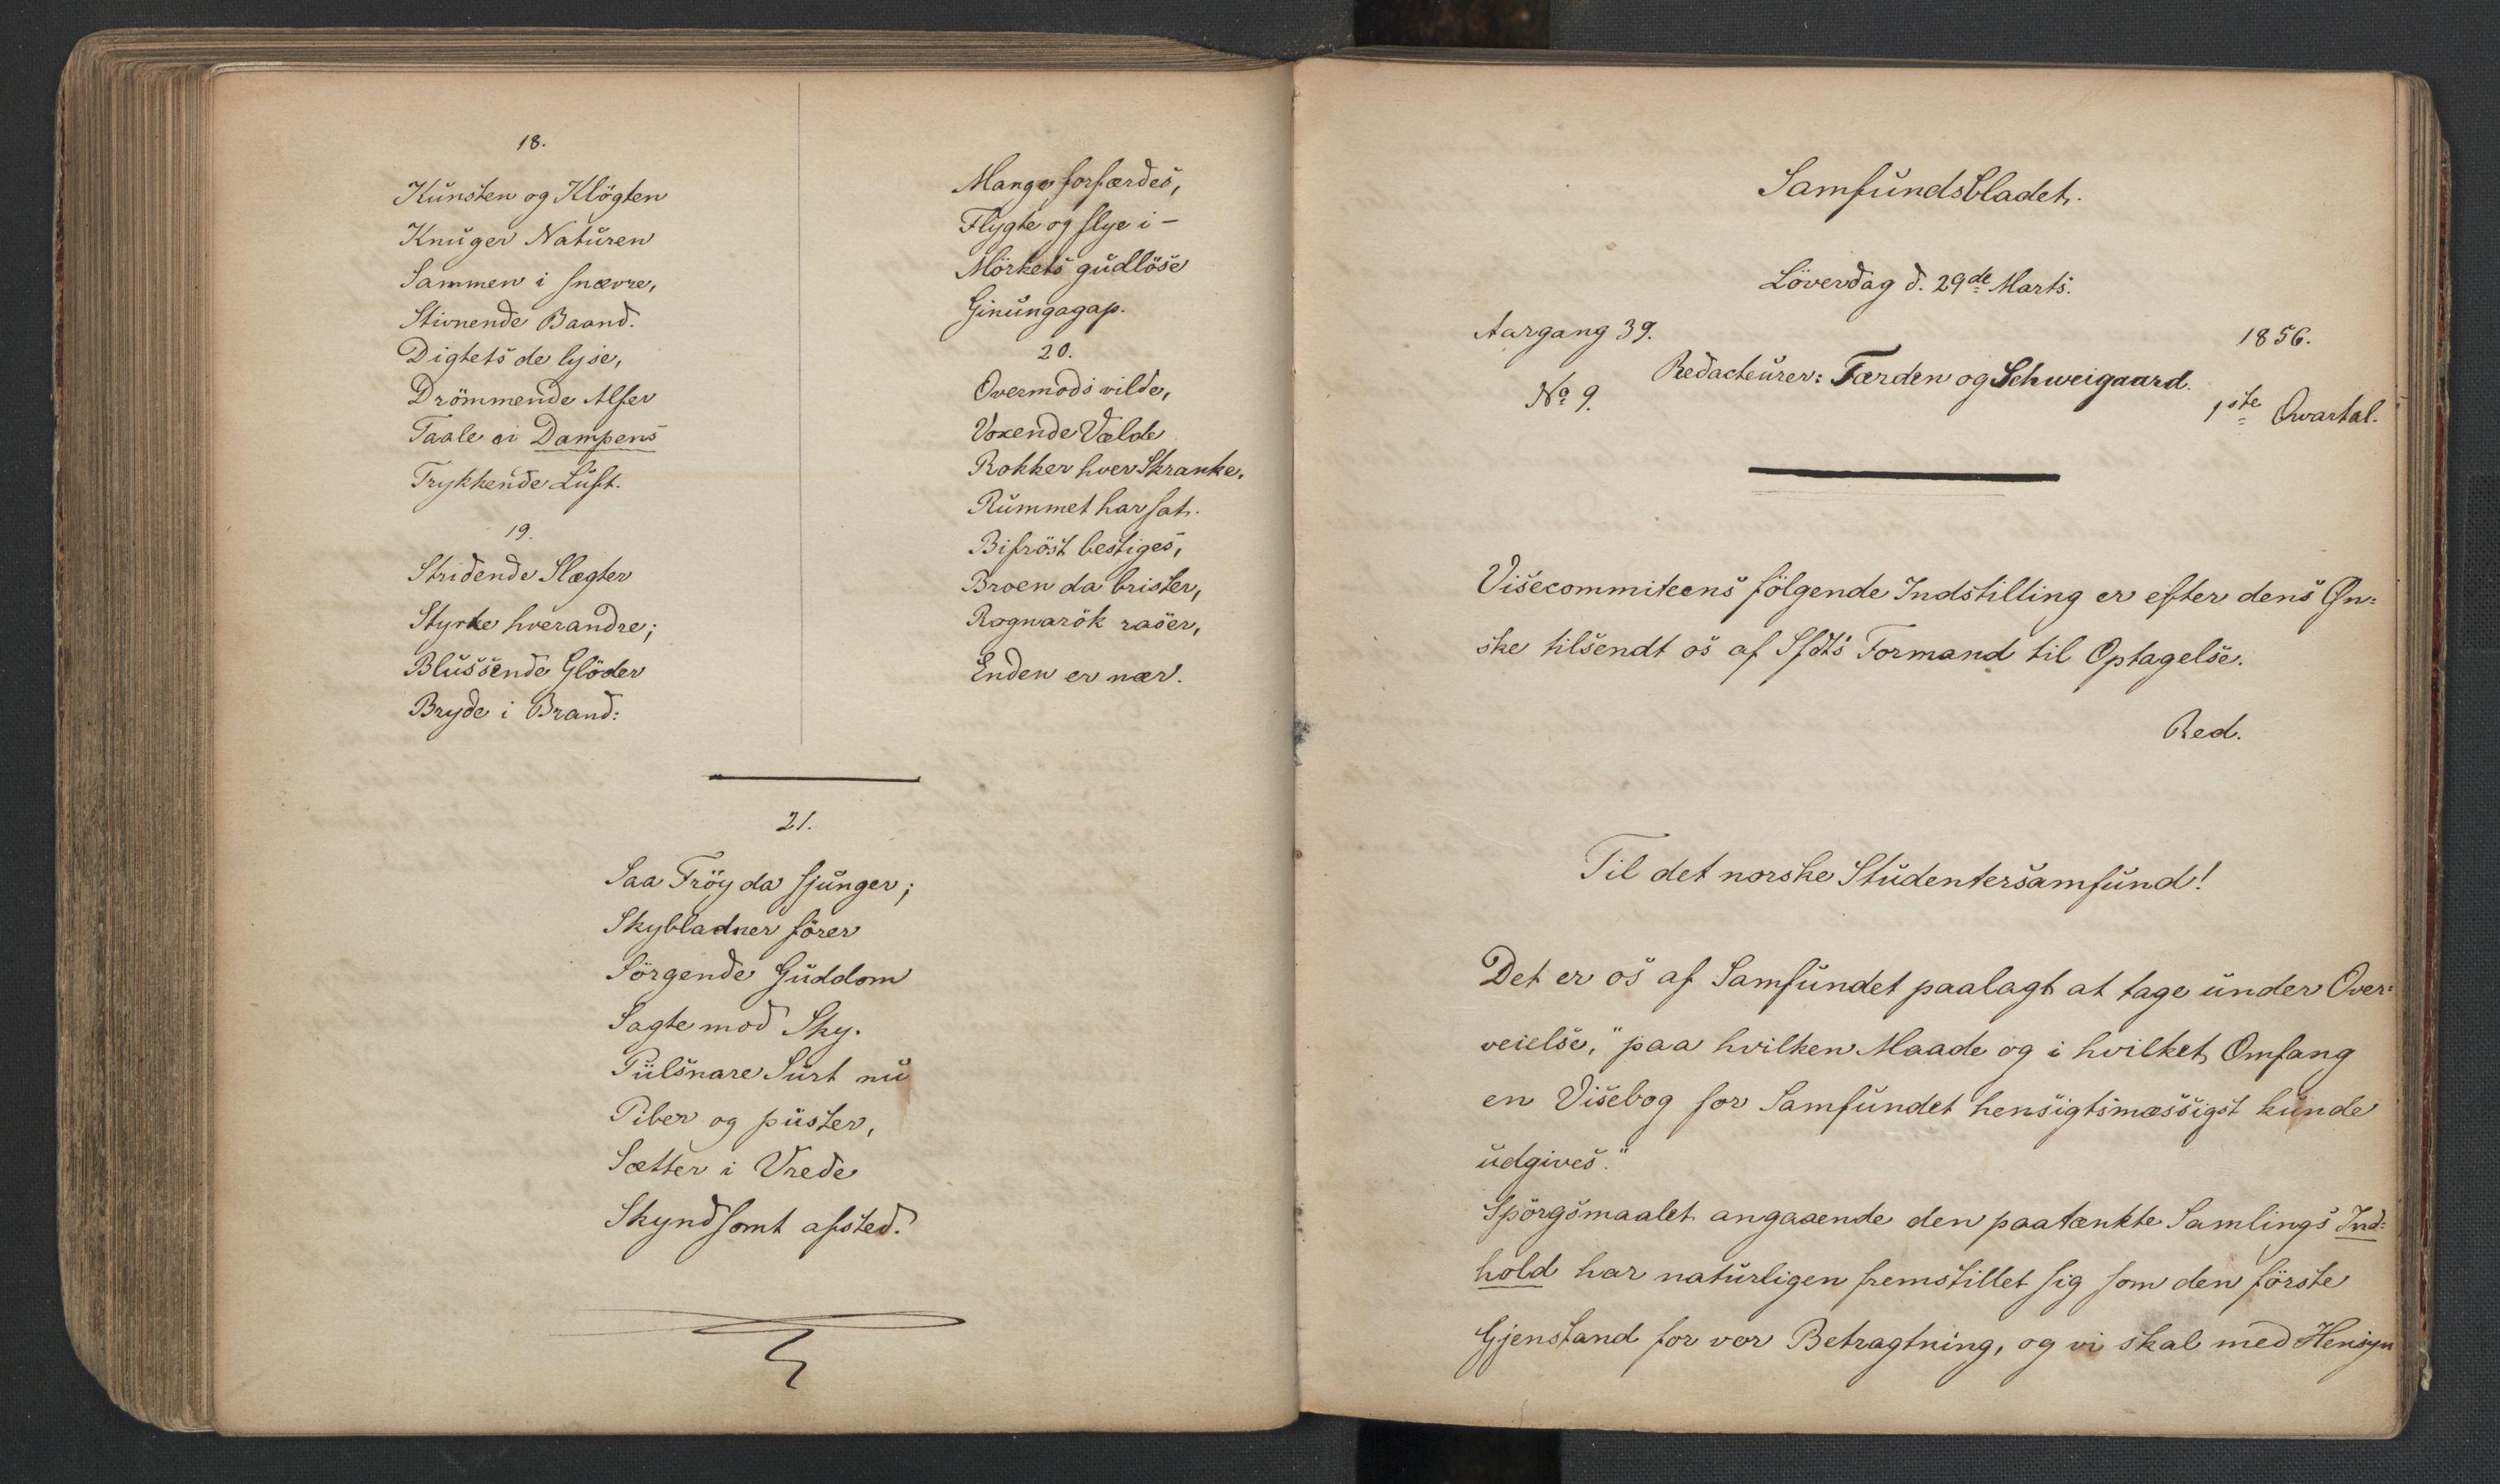 RA, Det Norske Studentersamfund, X/Xa/L0005, 1855-1856, s. 172